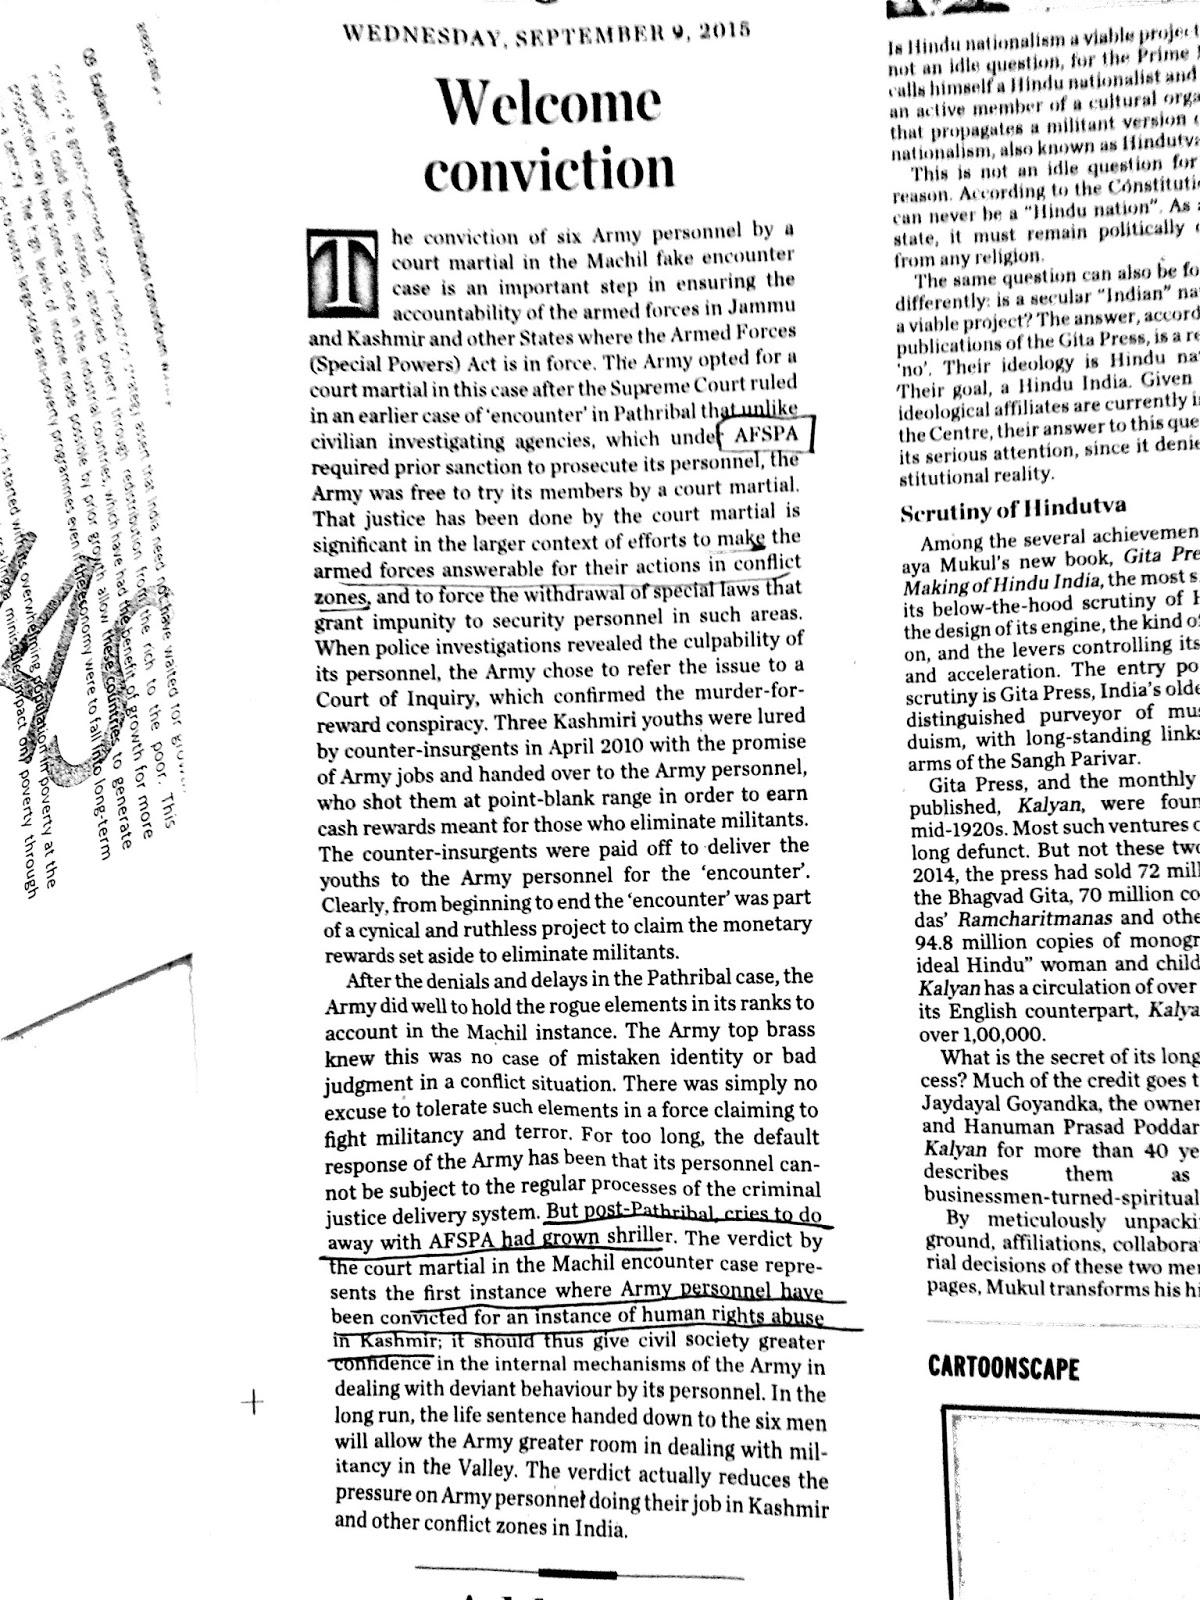 how to read newspaper for ias exam